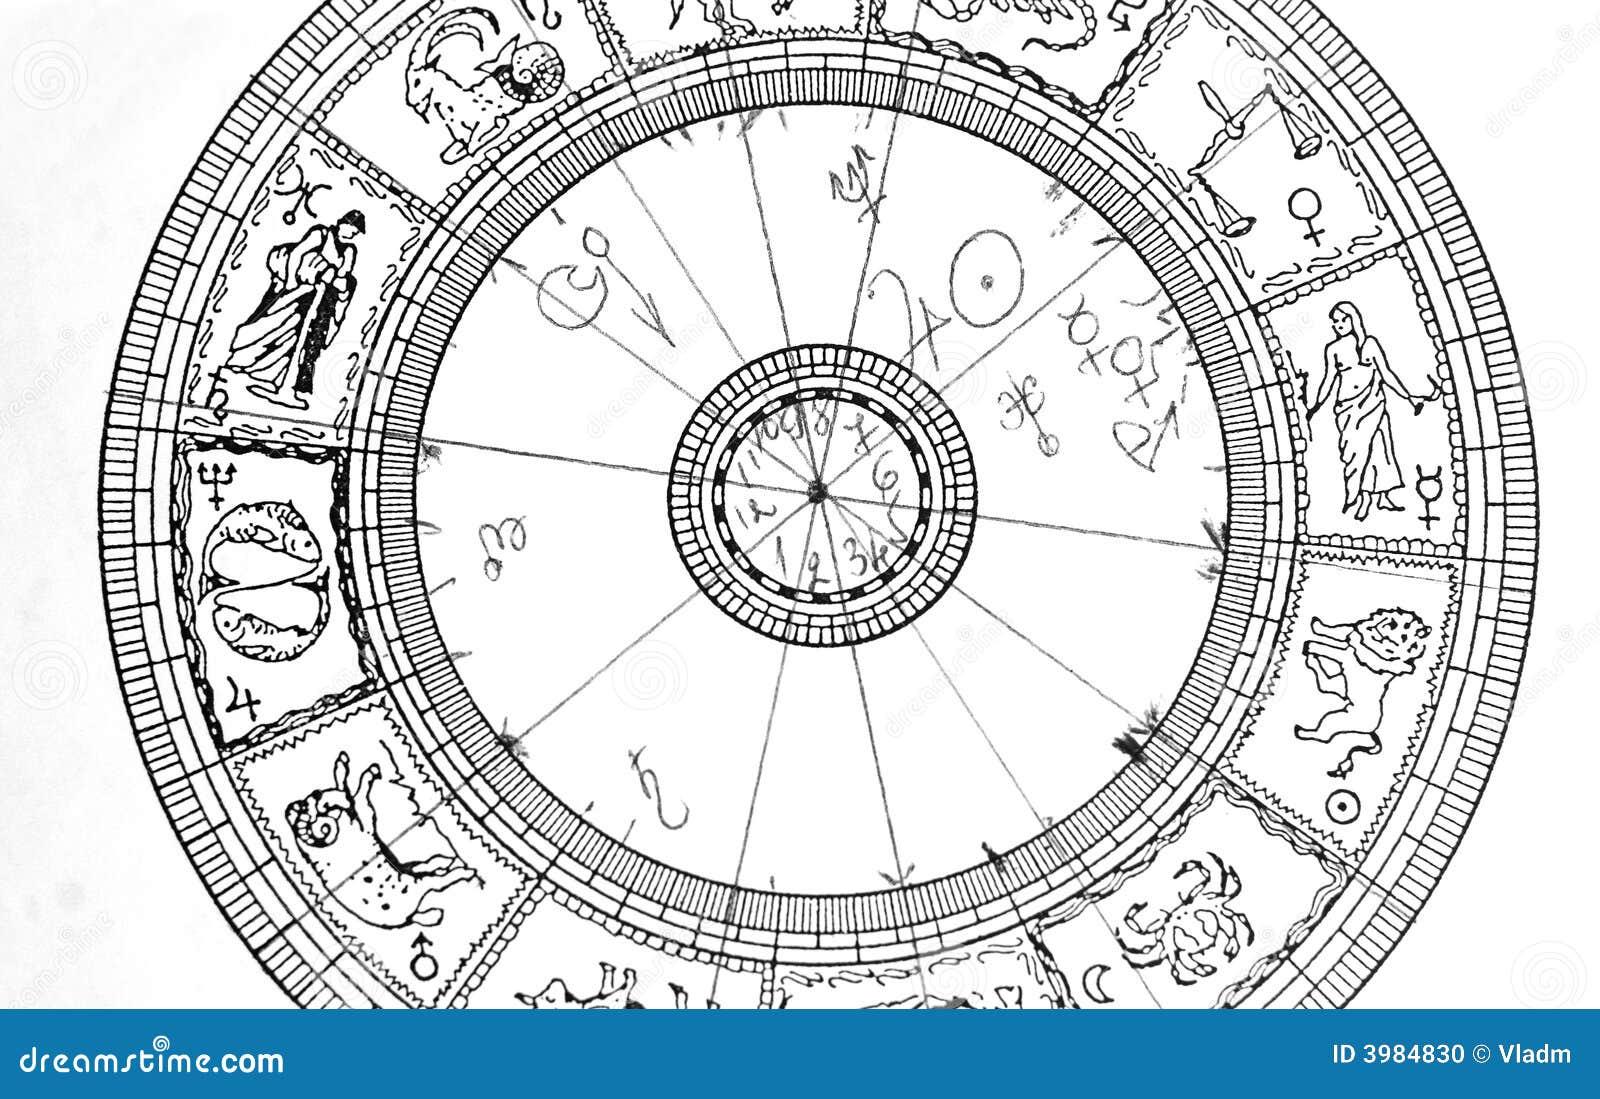 June 23 2016 scorpio horoscope